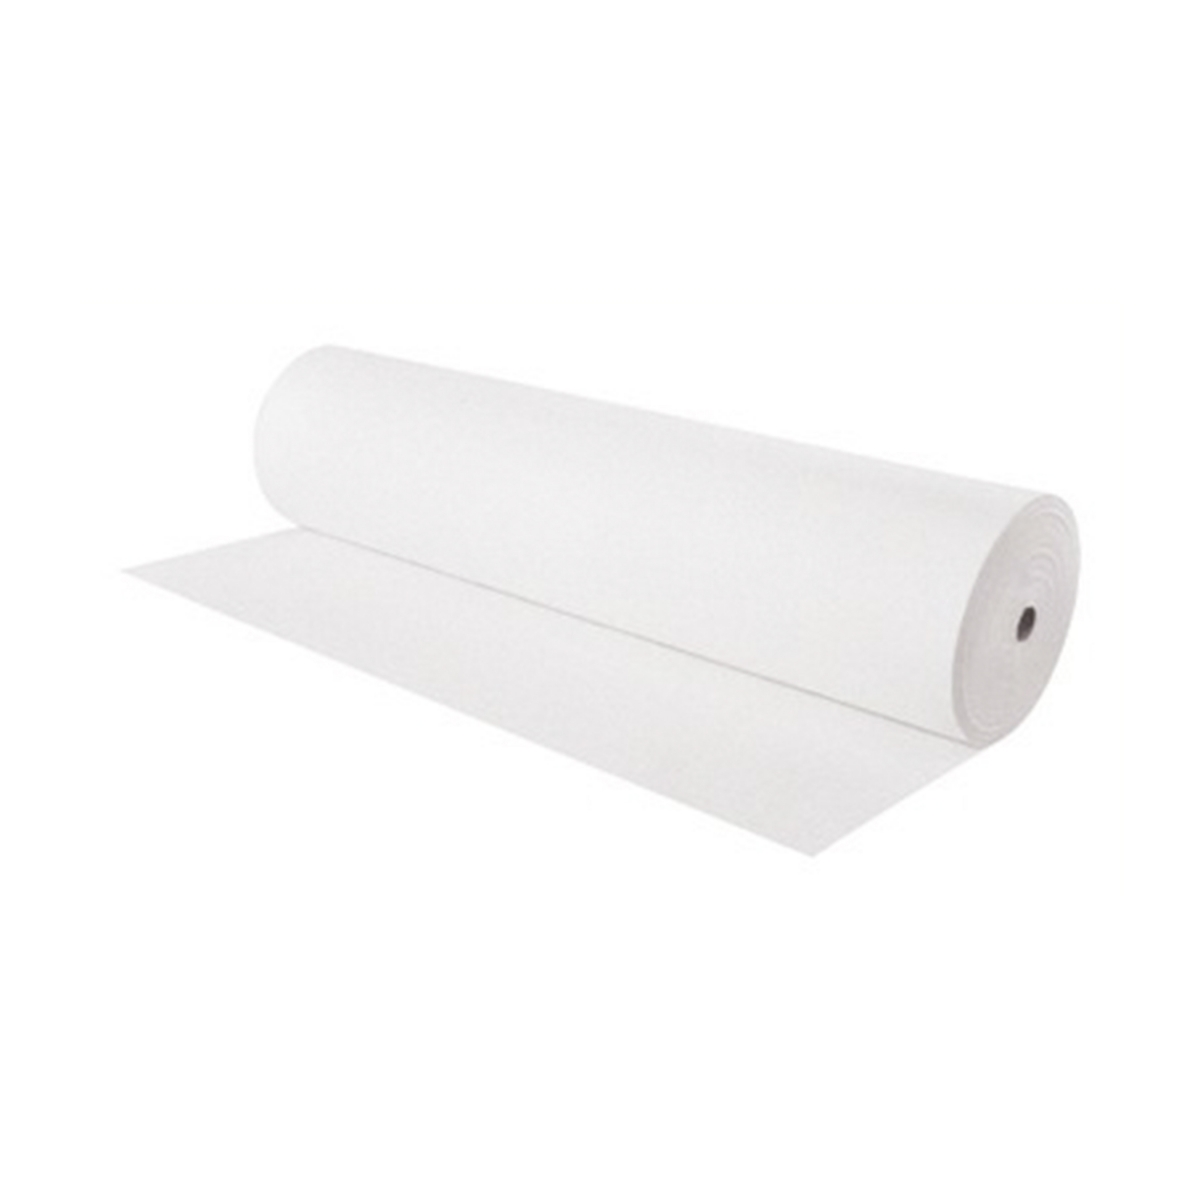 Schwimmbadvlies 450, 200 cm, weiß Schwimmbadvlies 450, 200 cm, weiß